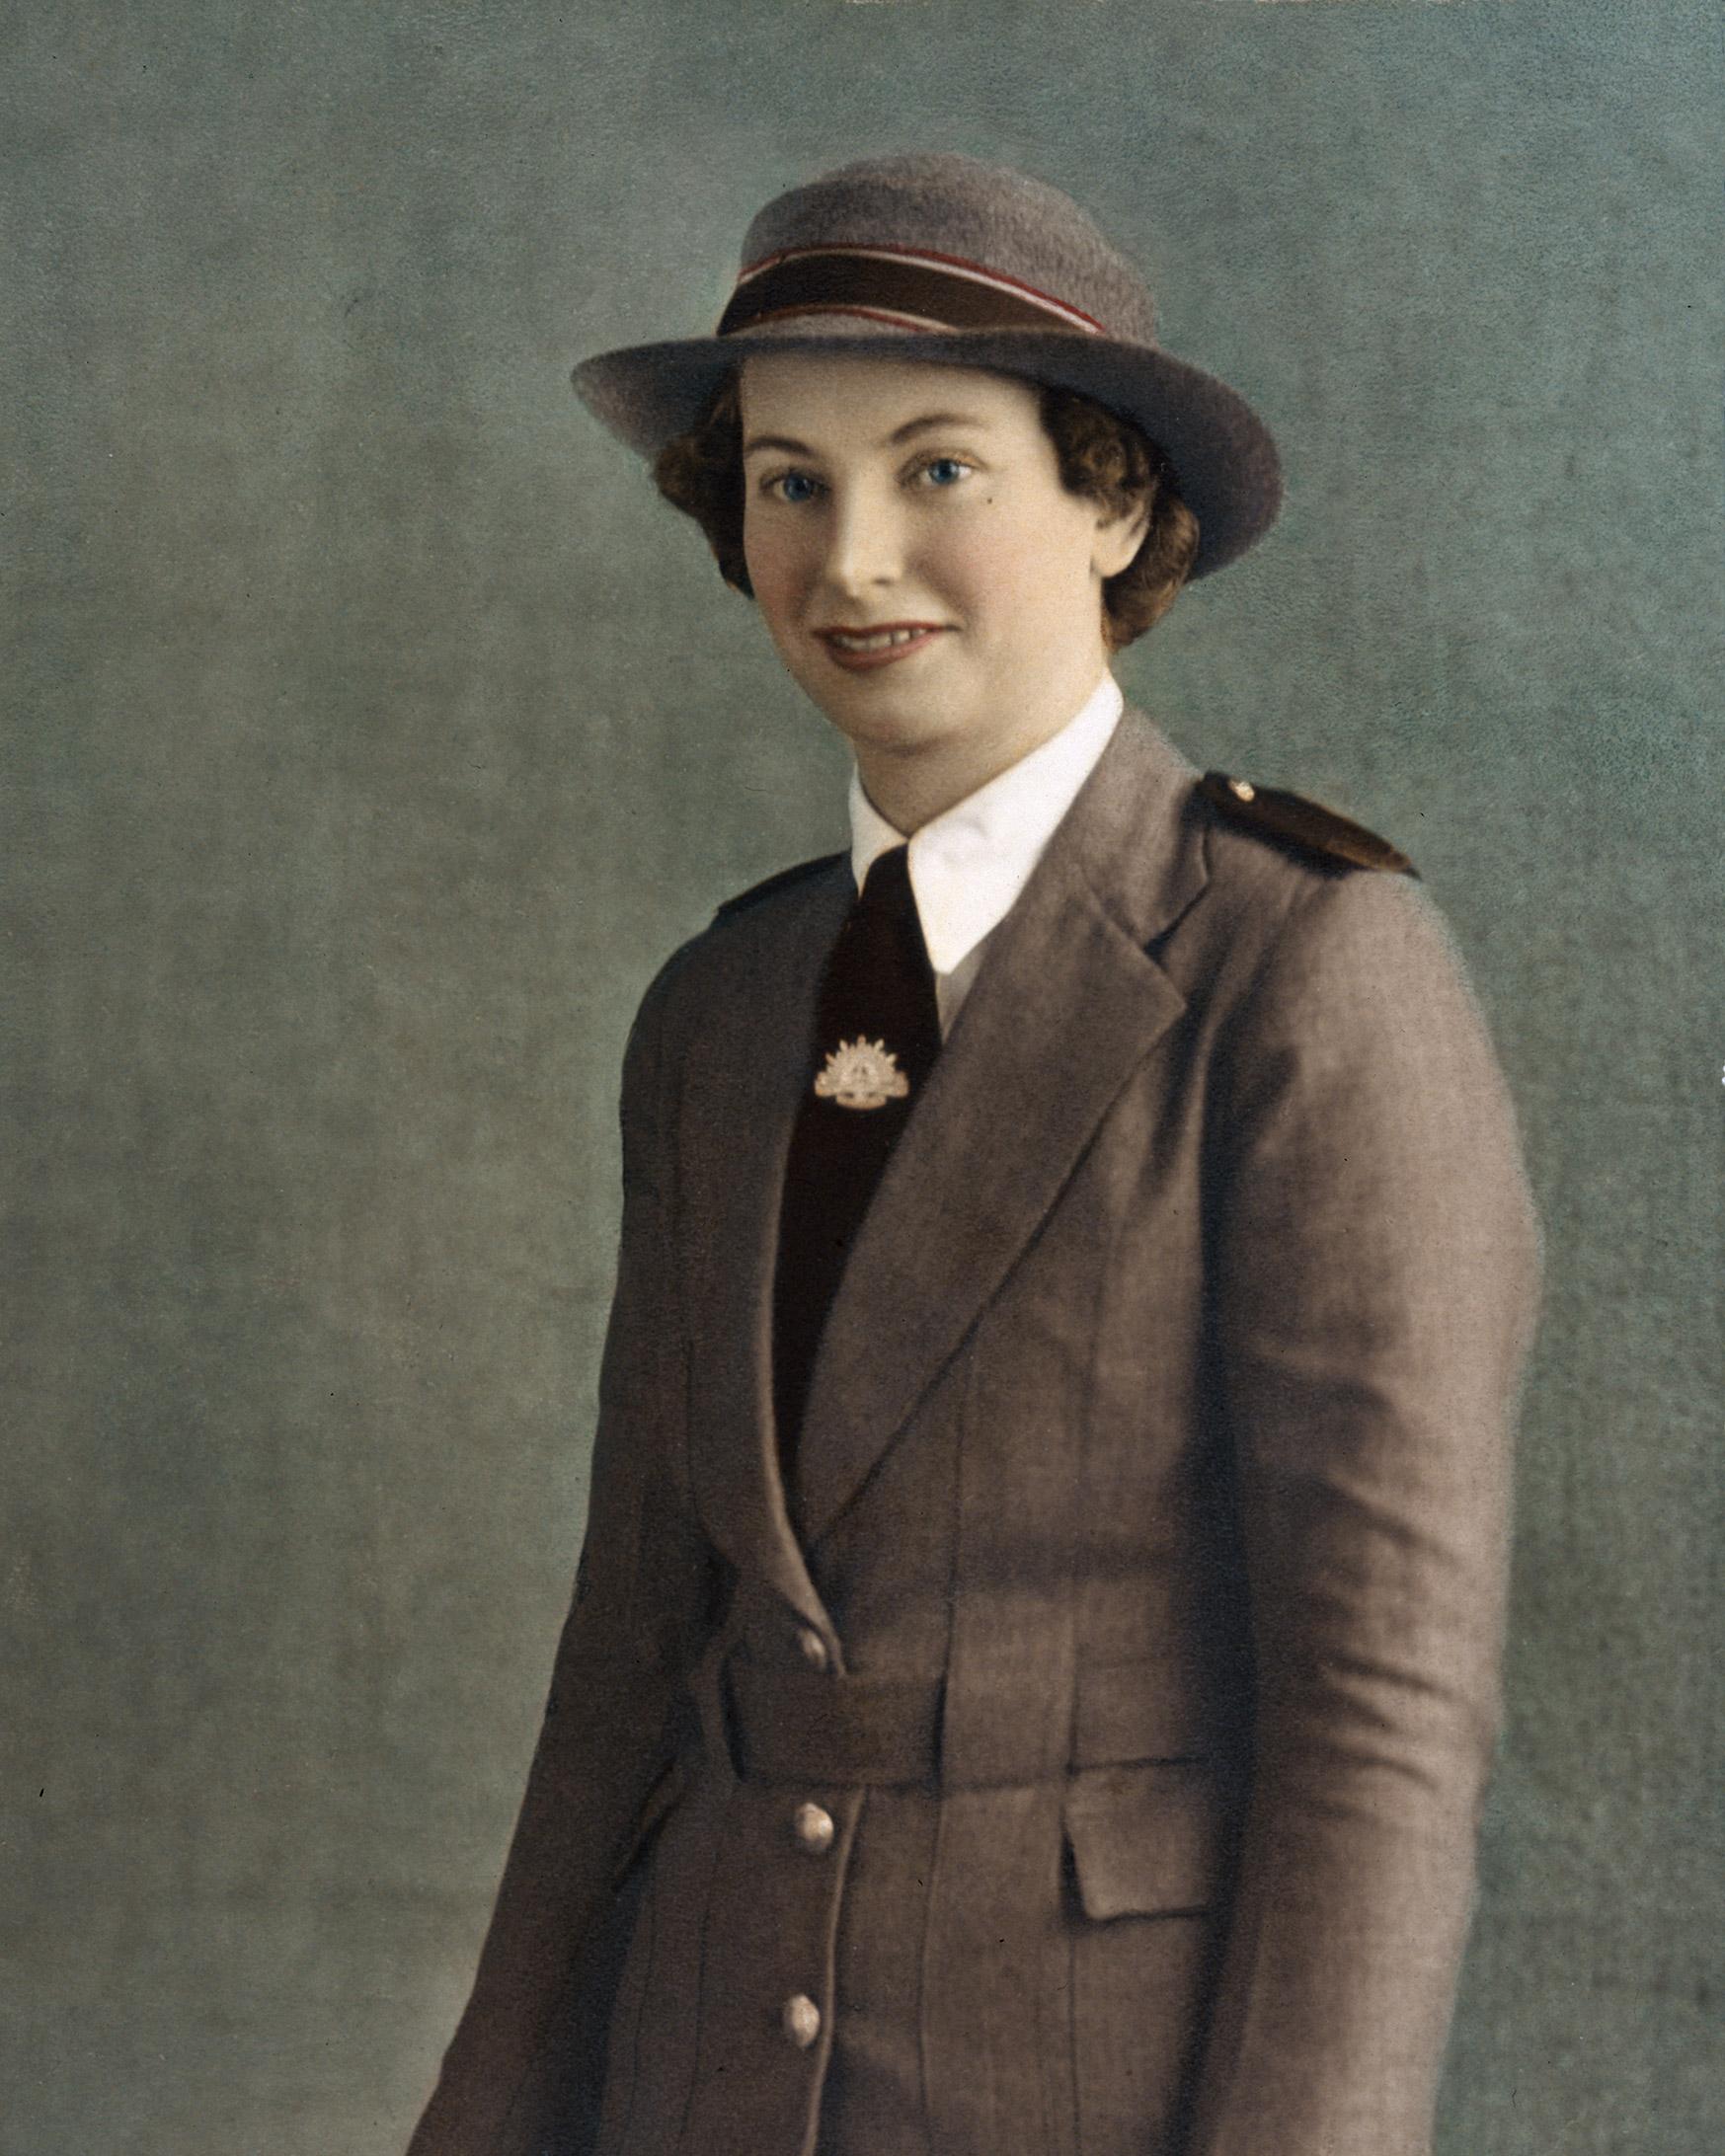 Vivian Bullwinkel